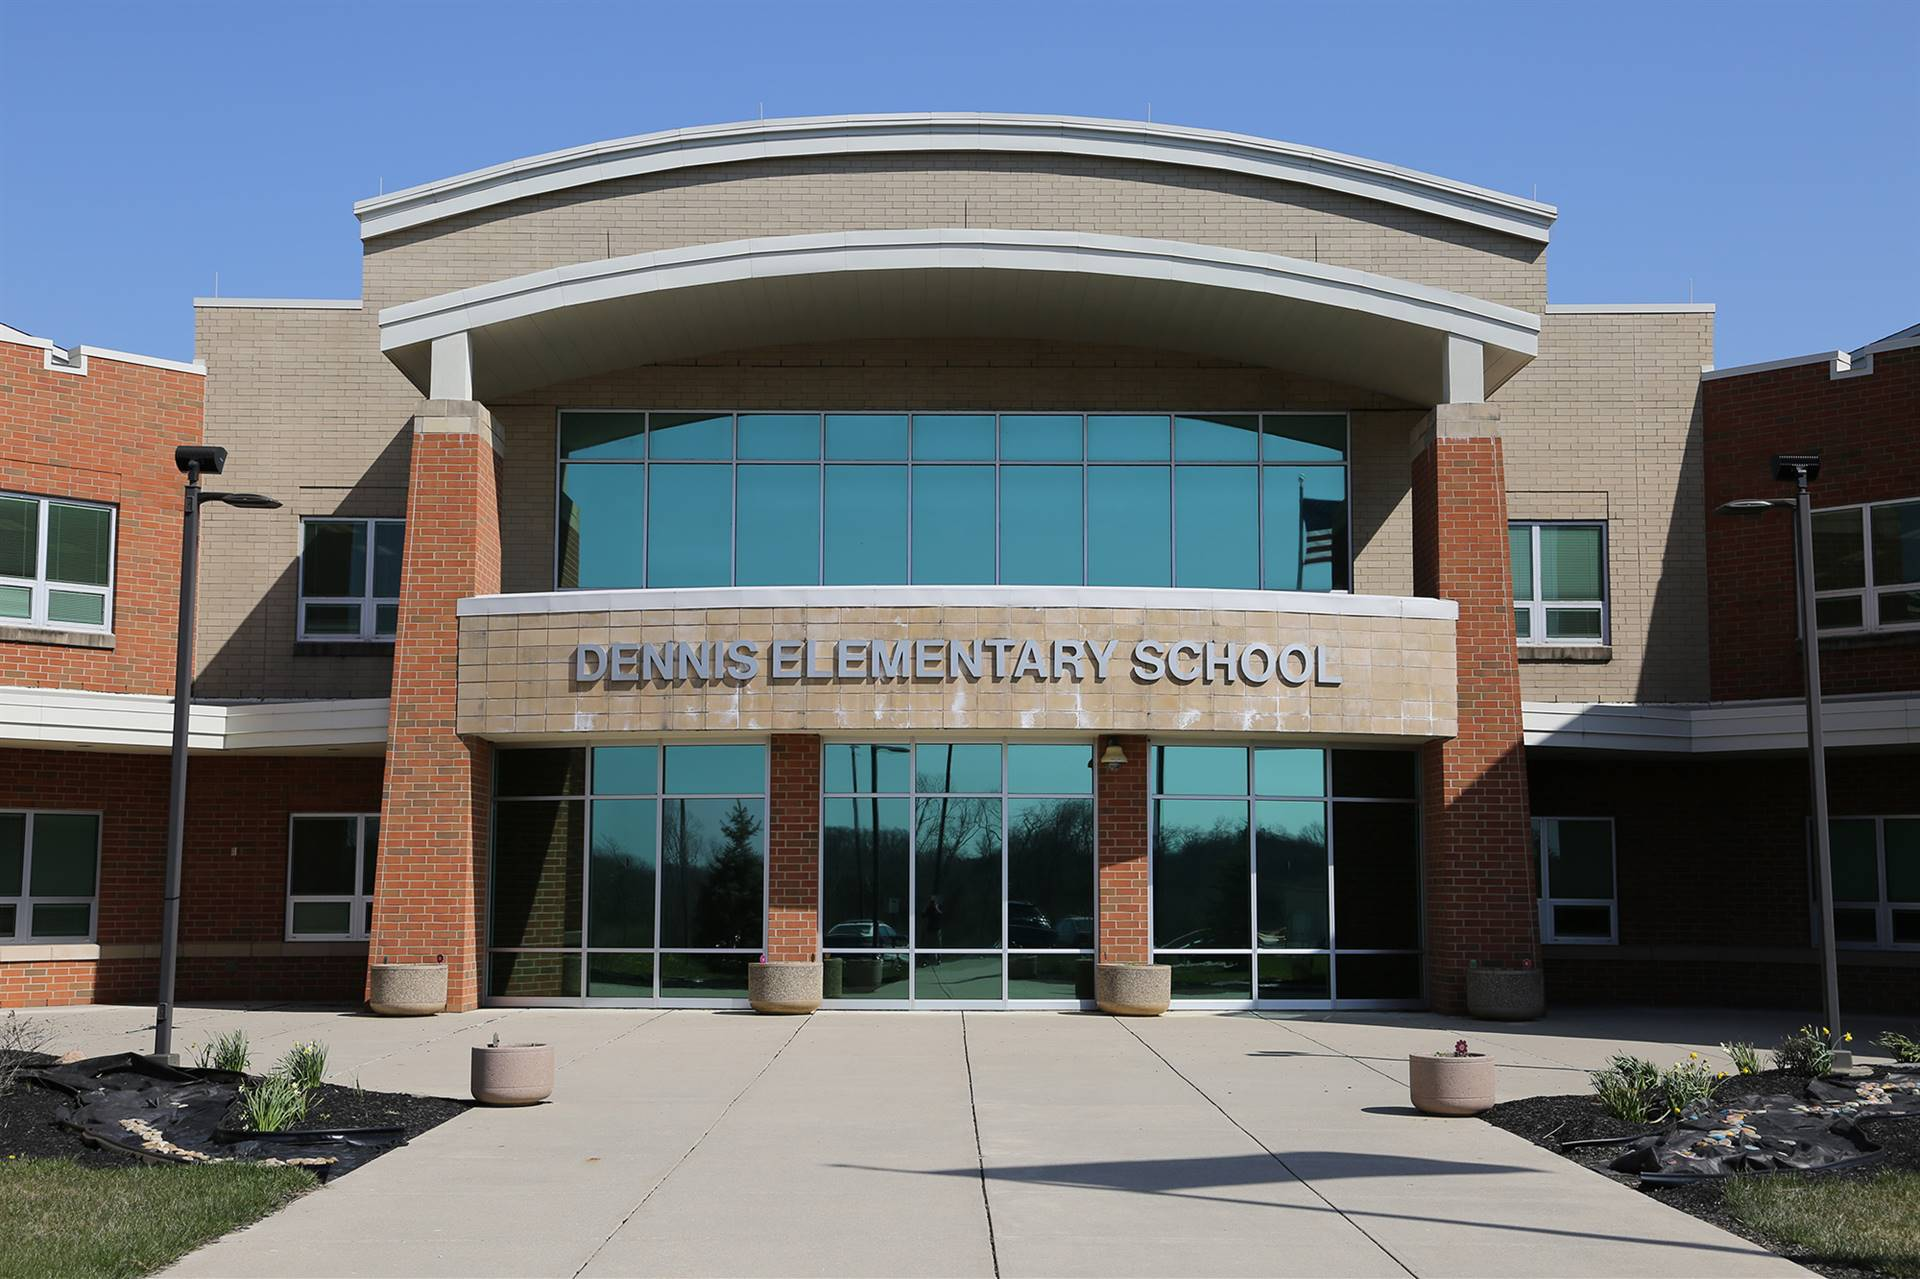 Dennis Elementary